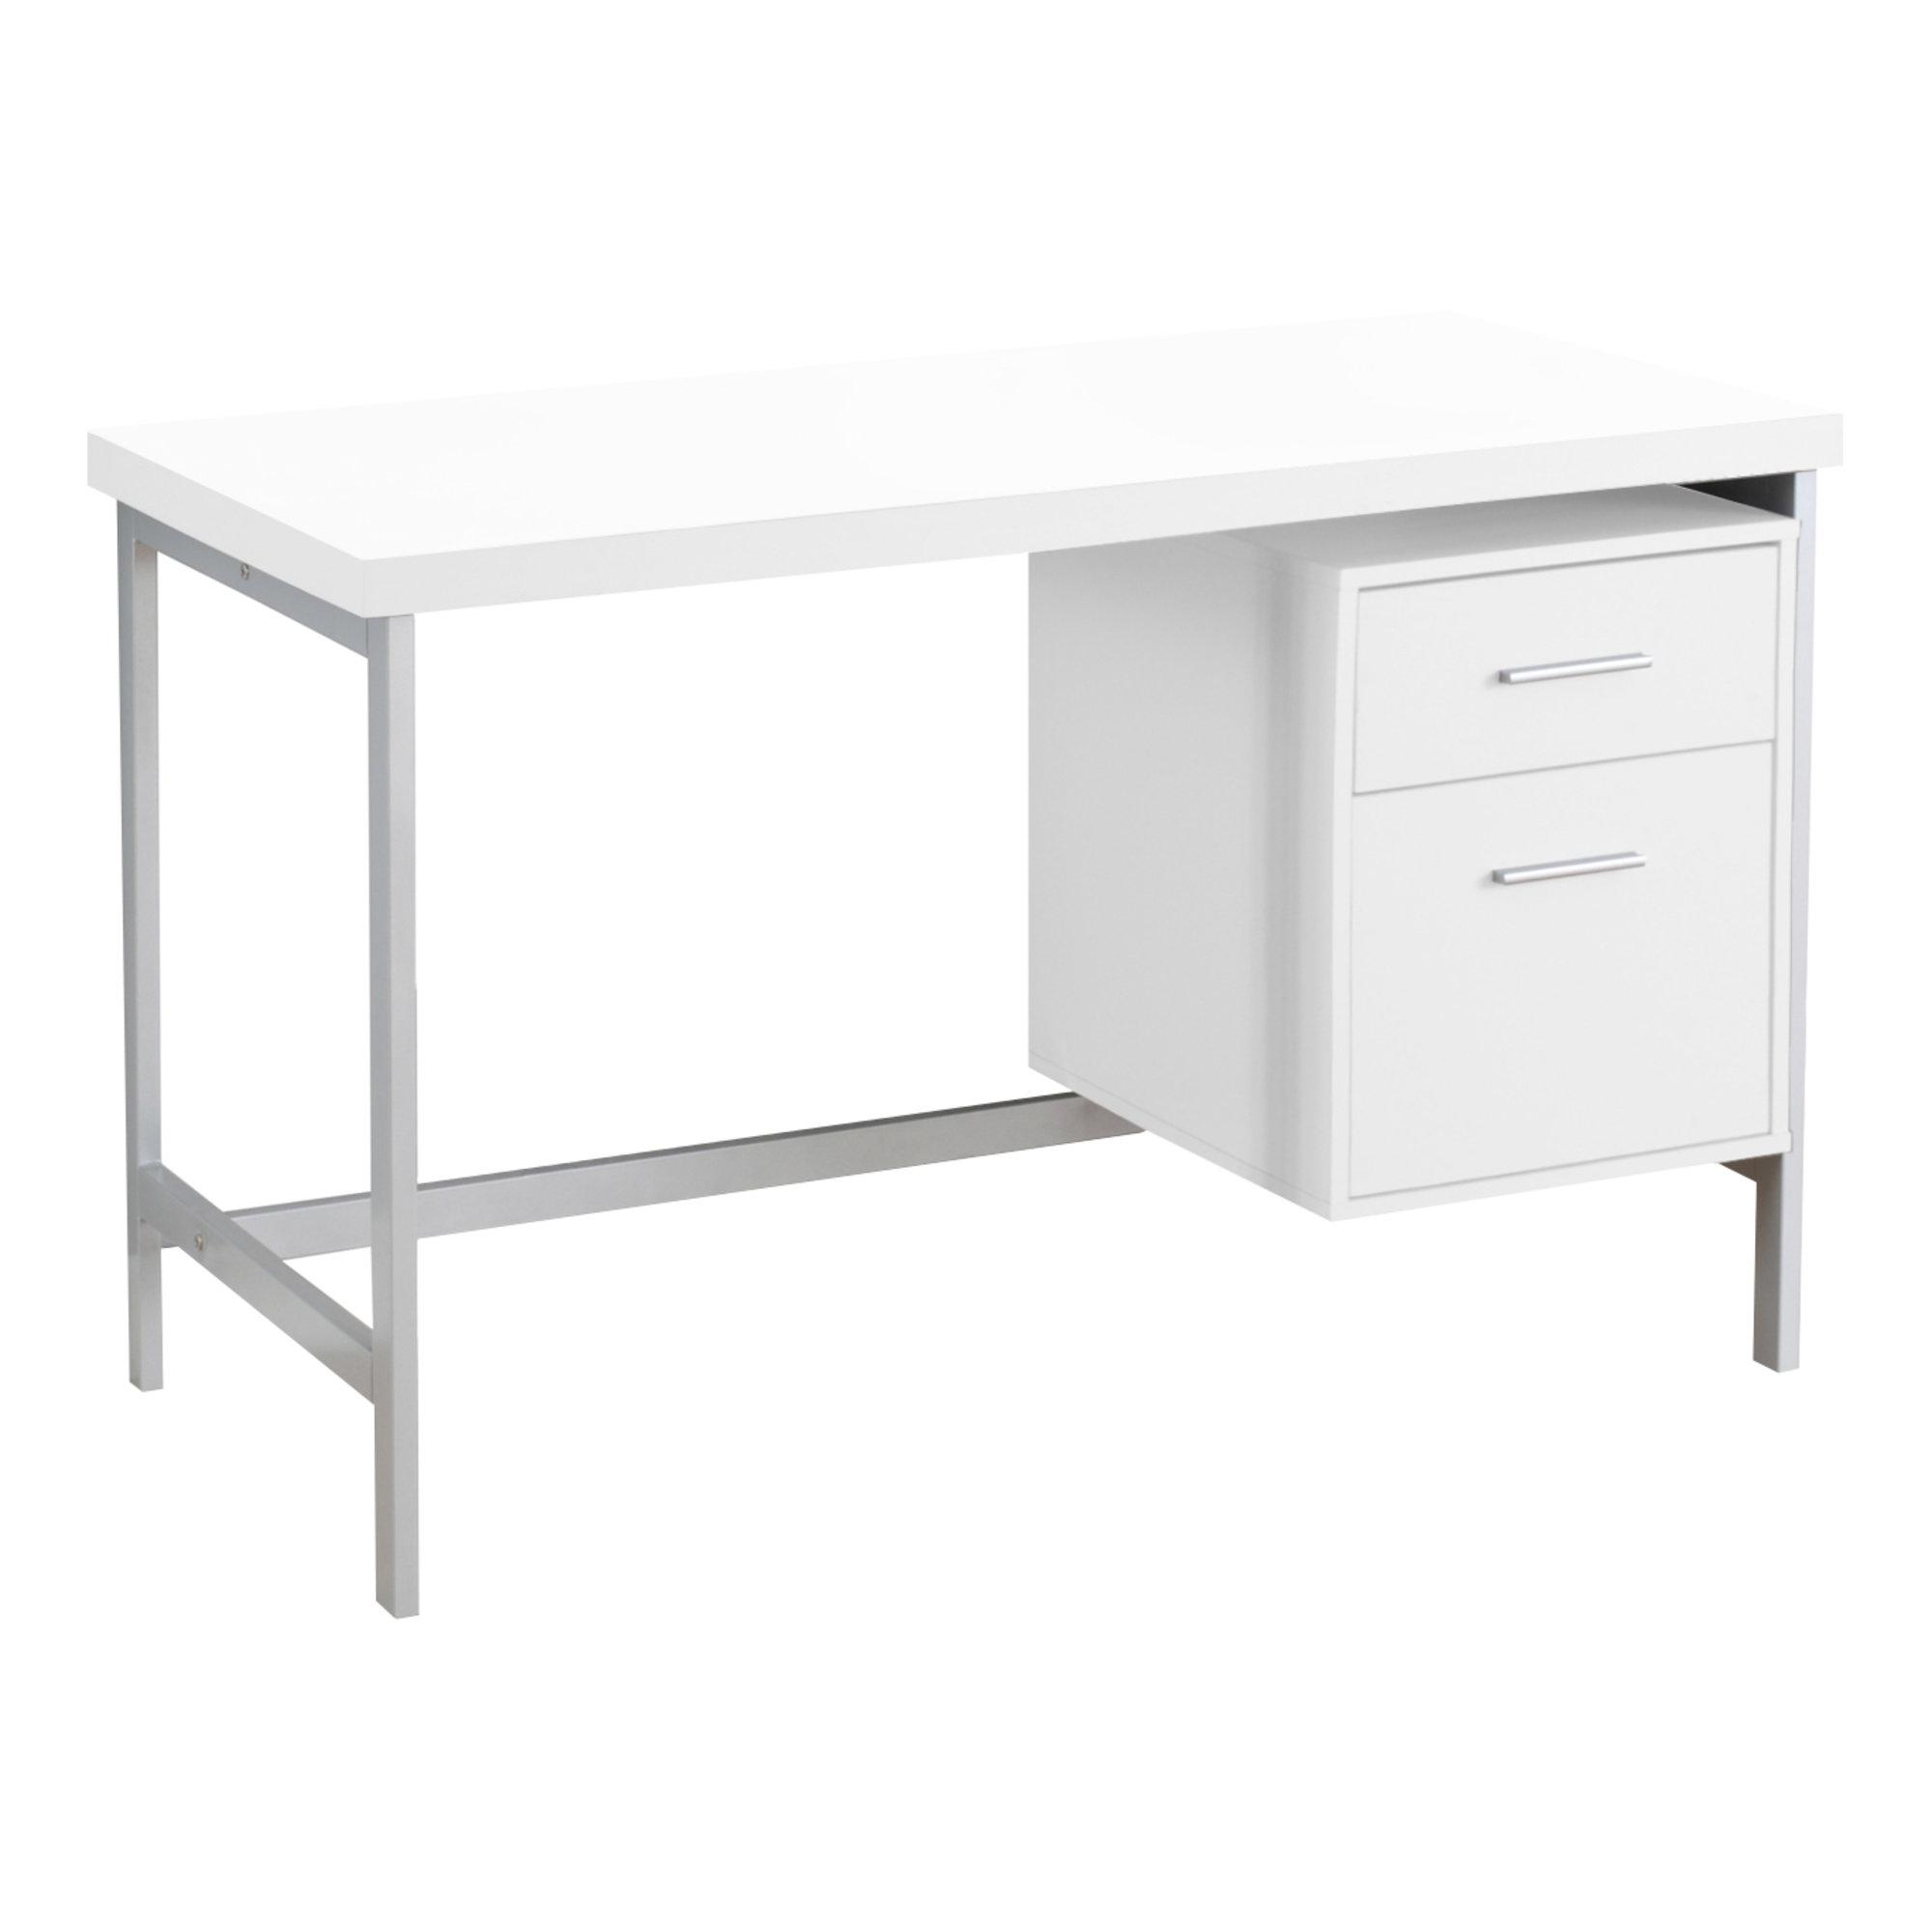 "23.75"" x 47.25"" x 30.75"" White Silver Particle Board Hollow Core Metal  Computer Desk"